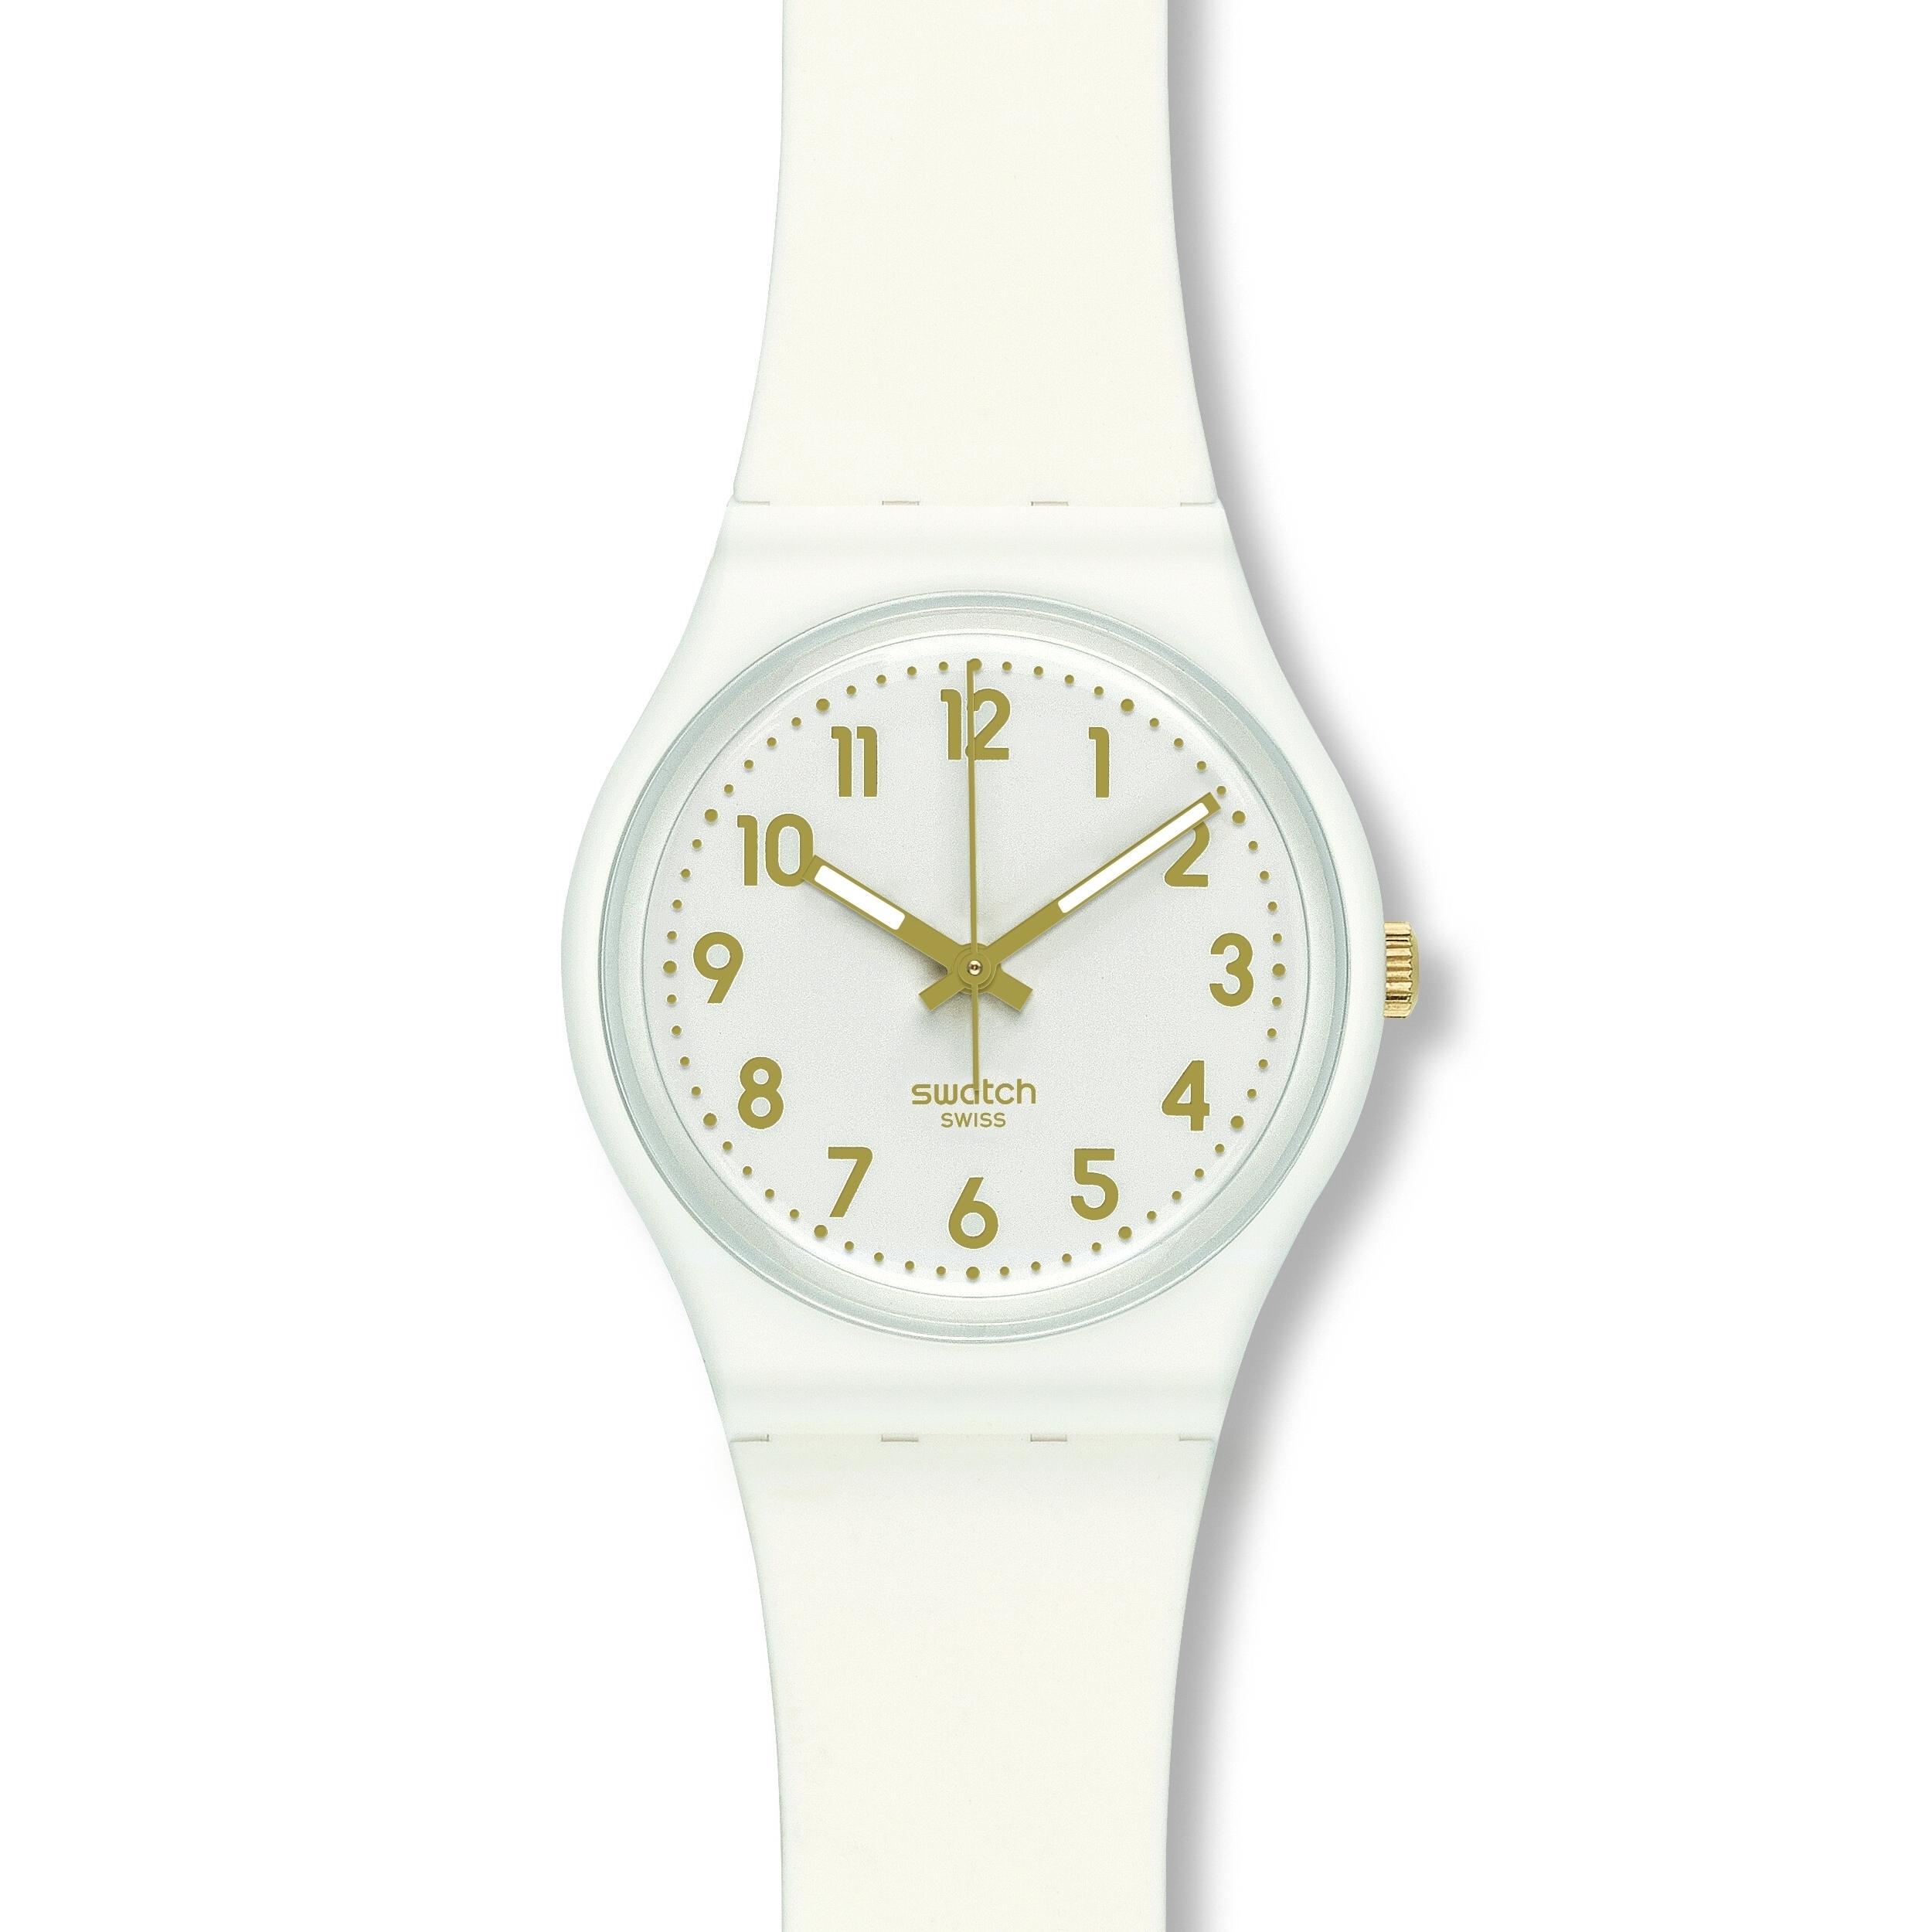 e8438ee881e7 Ladies Swatch White Bishop Watch (GW164)